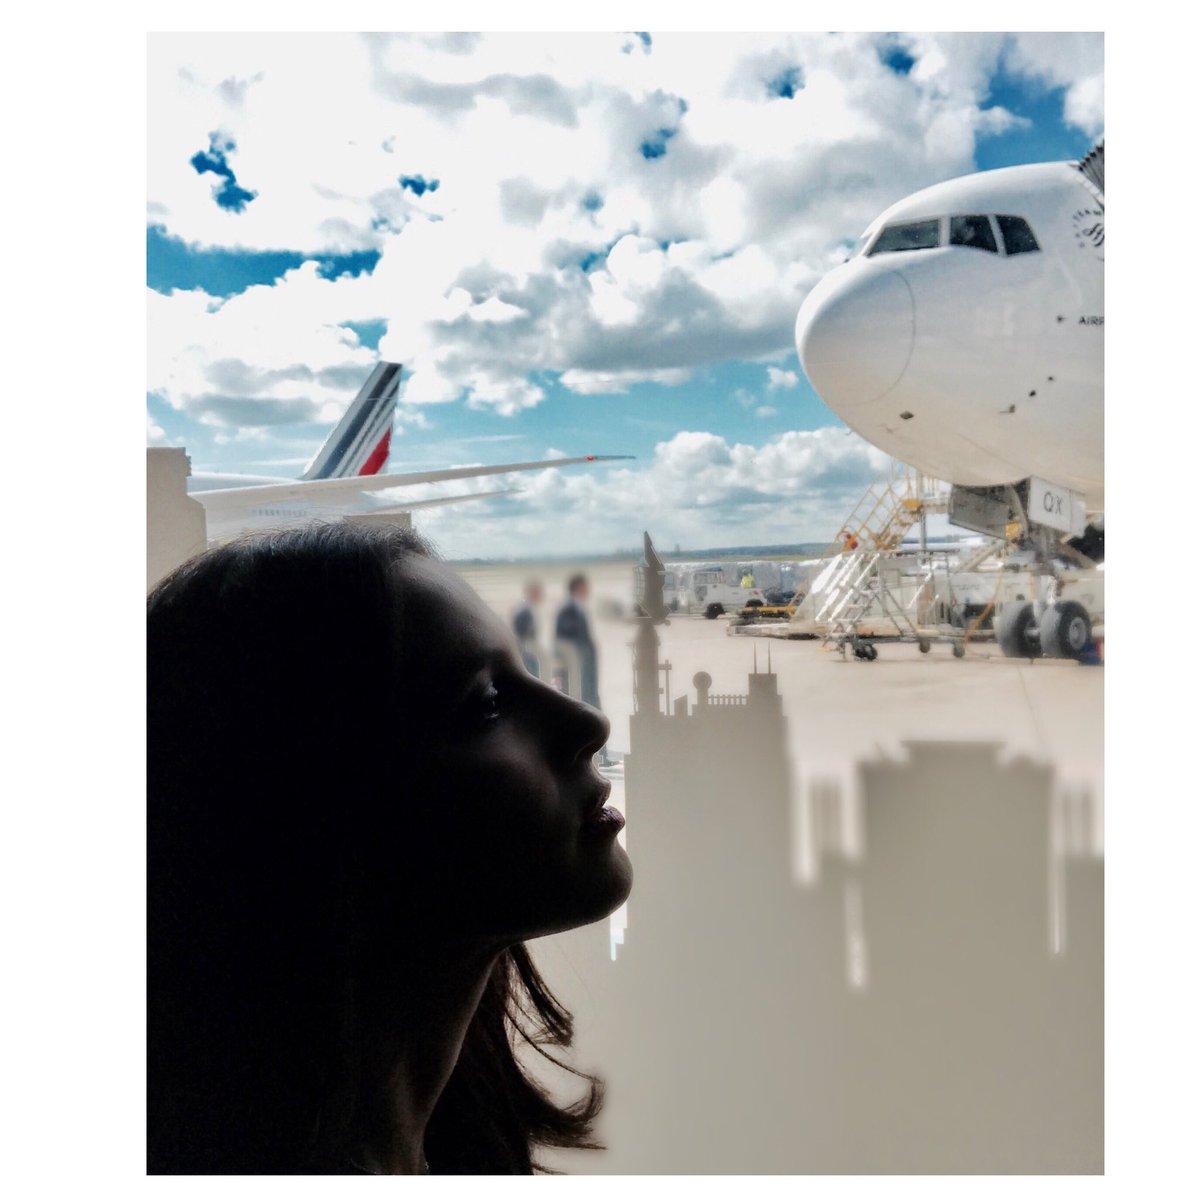 À nous deux New-York !!!... #Partir #BirthdayTrip #BigApple #NY #Plane #SeeYa <br>http://pic.twitter.com/5YJyn46rz8